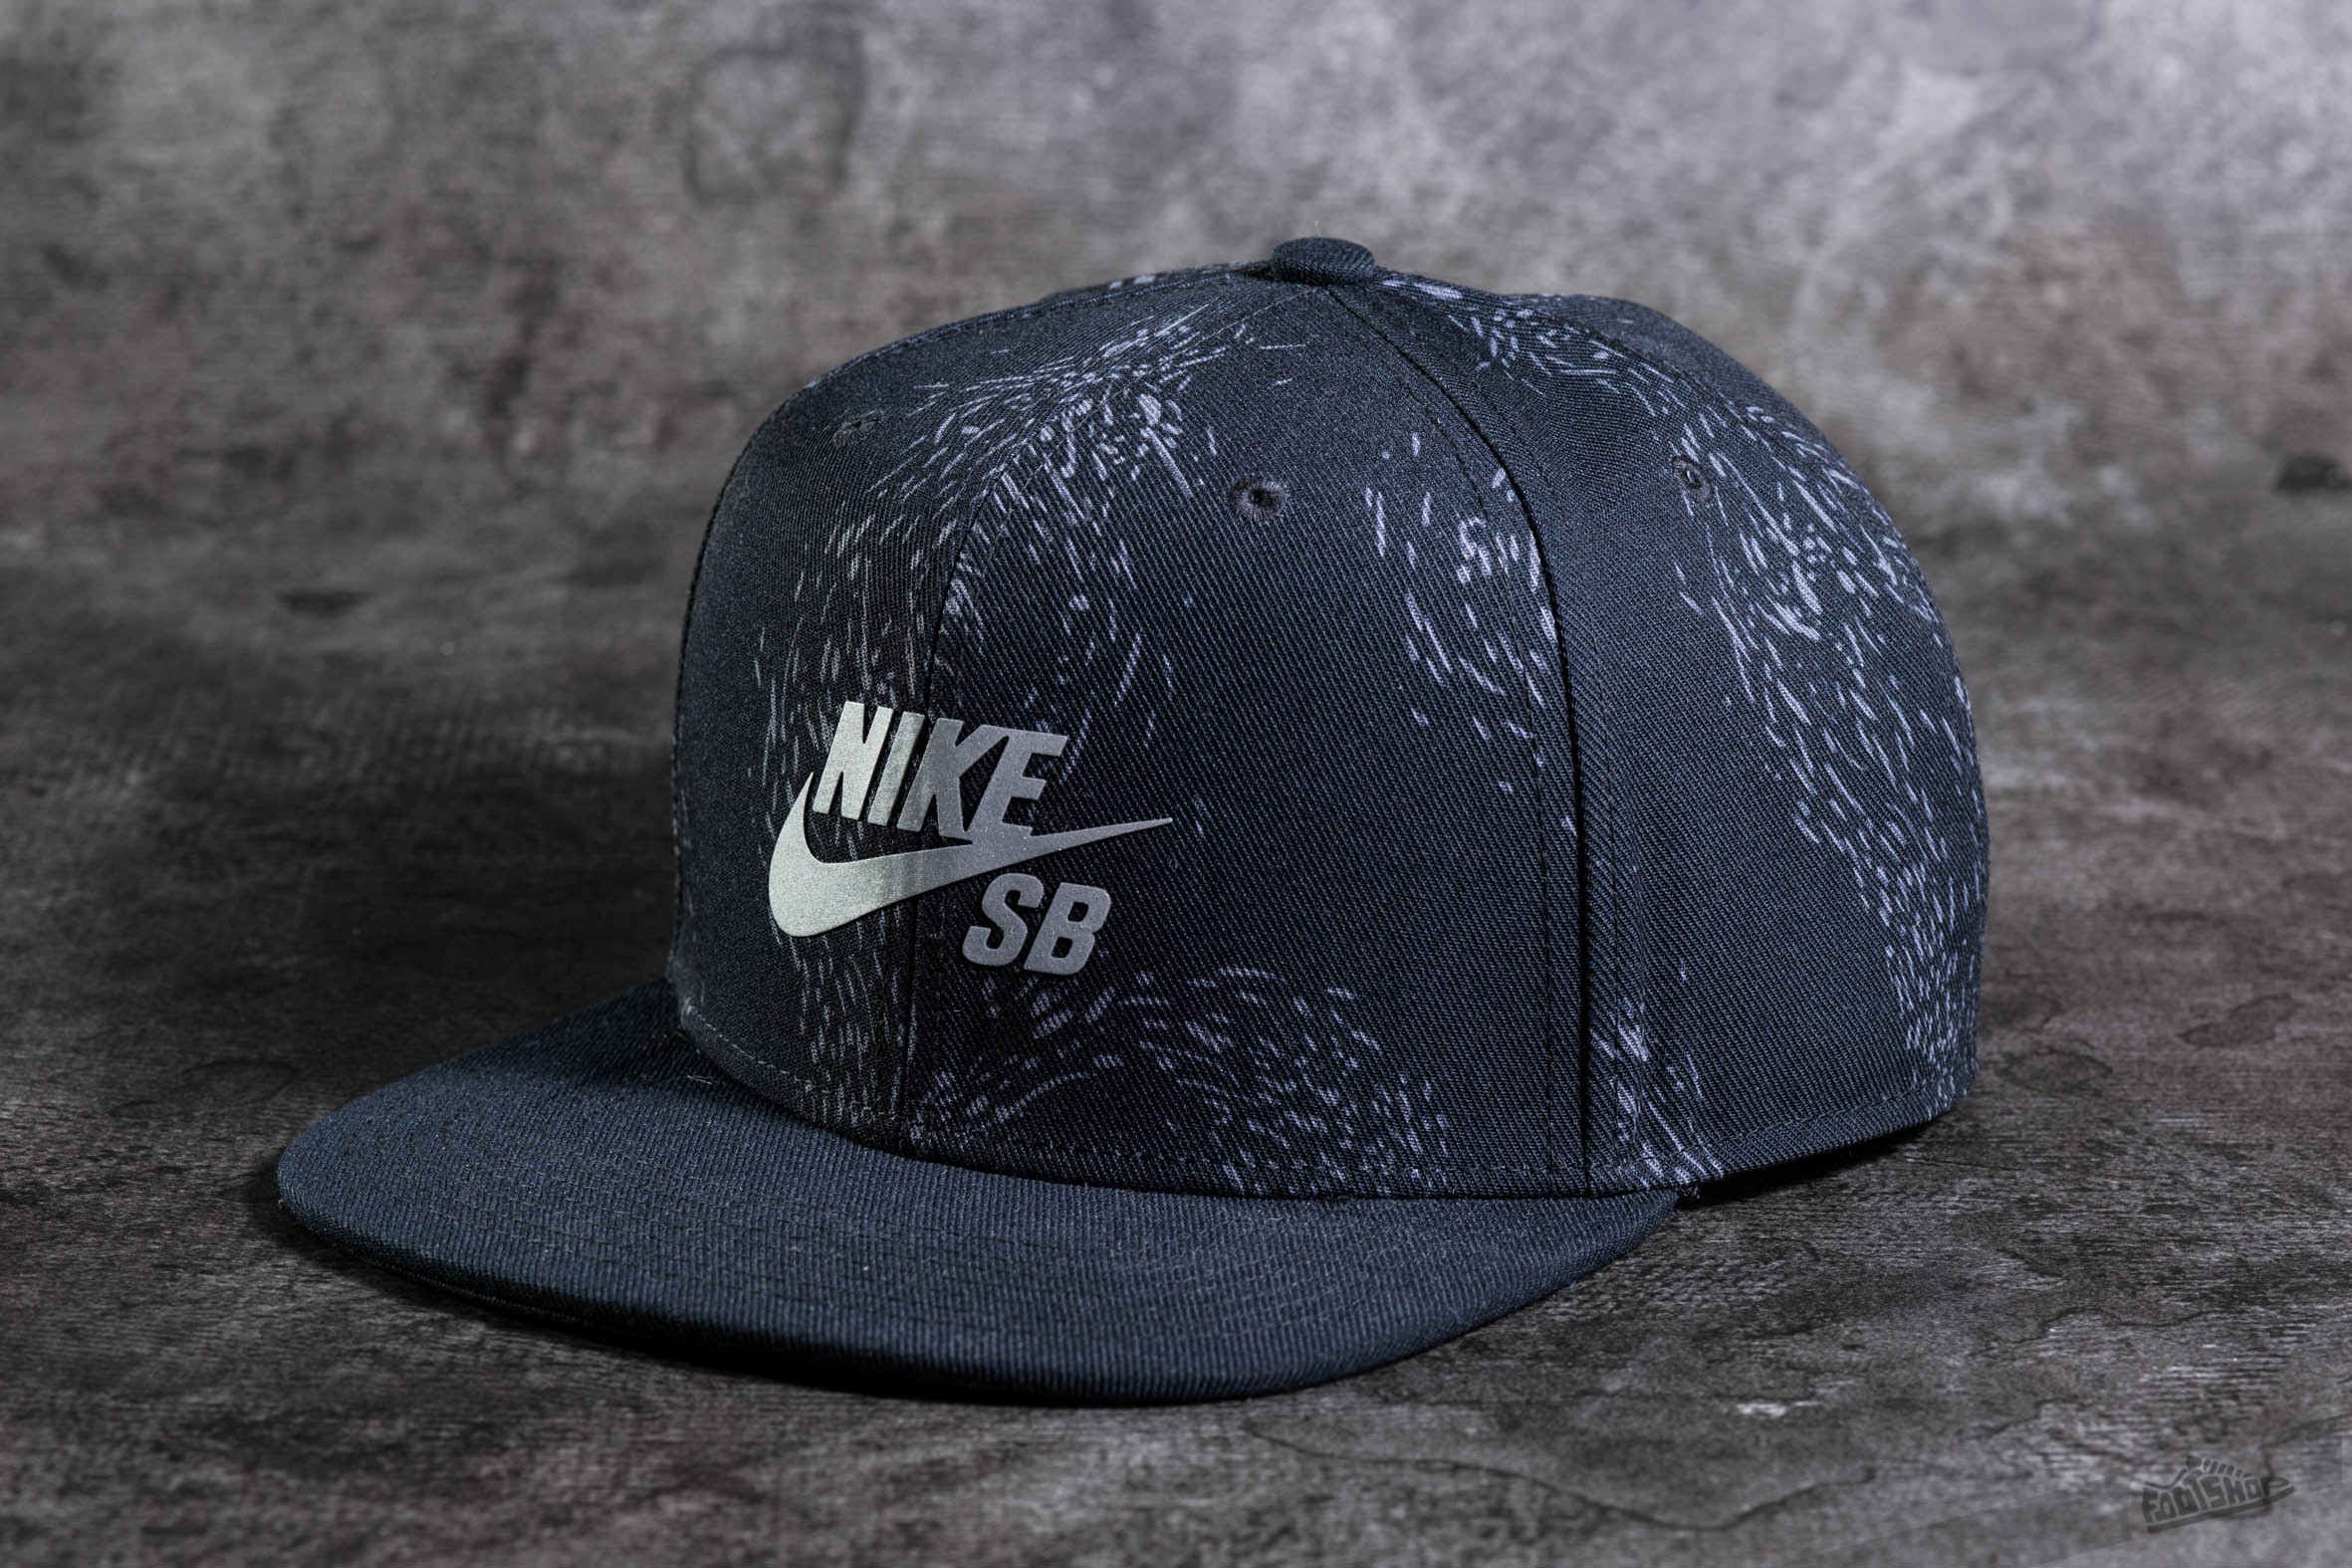 07c079564c Nike SB Swarm Snapback Black